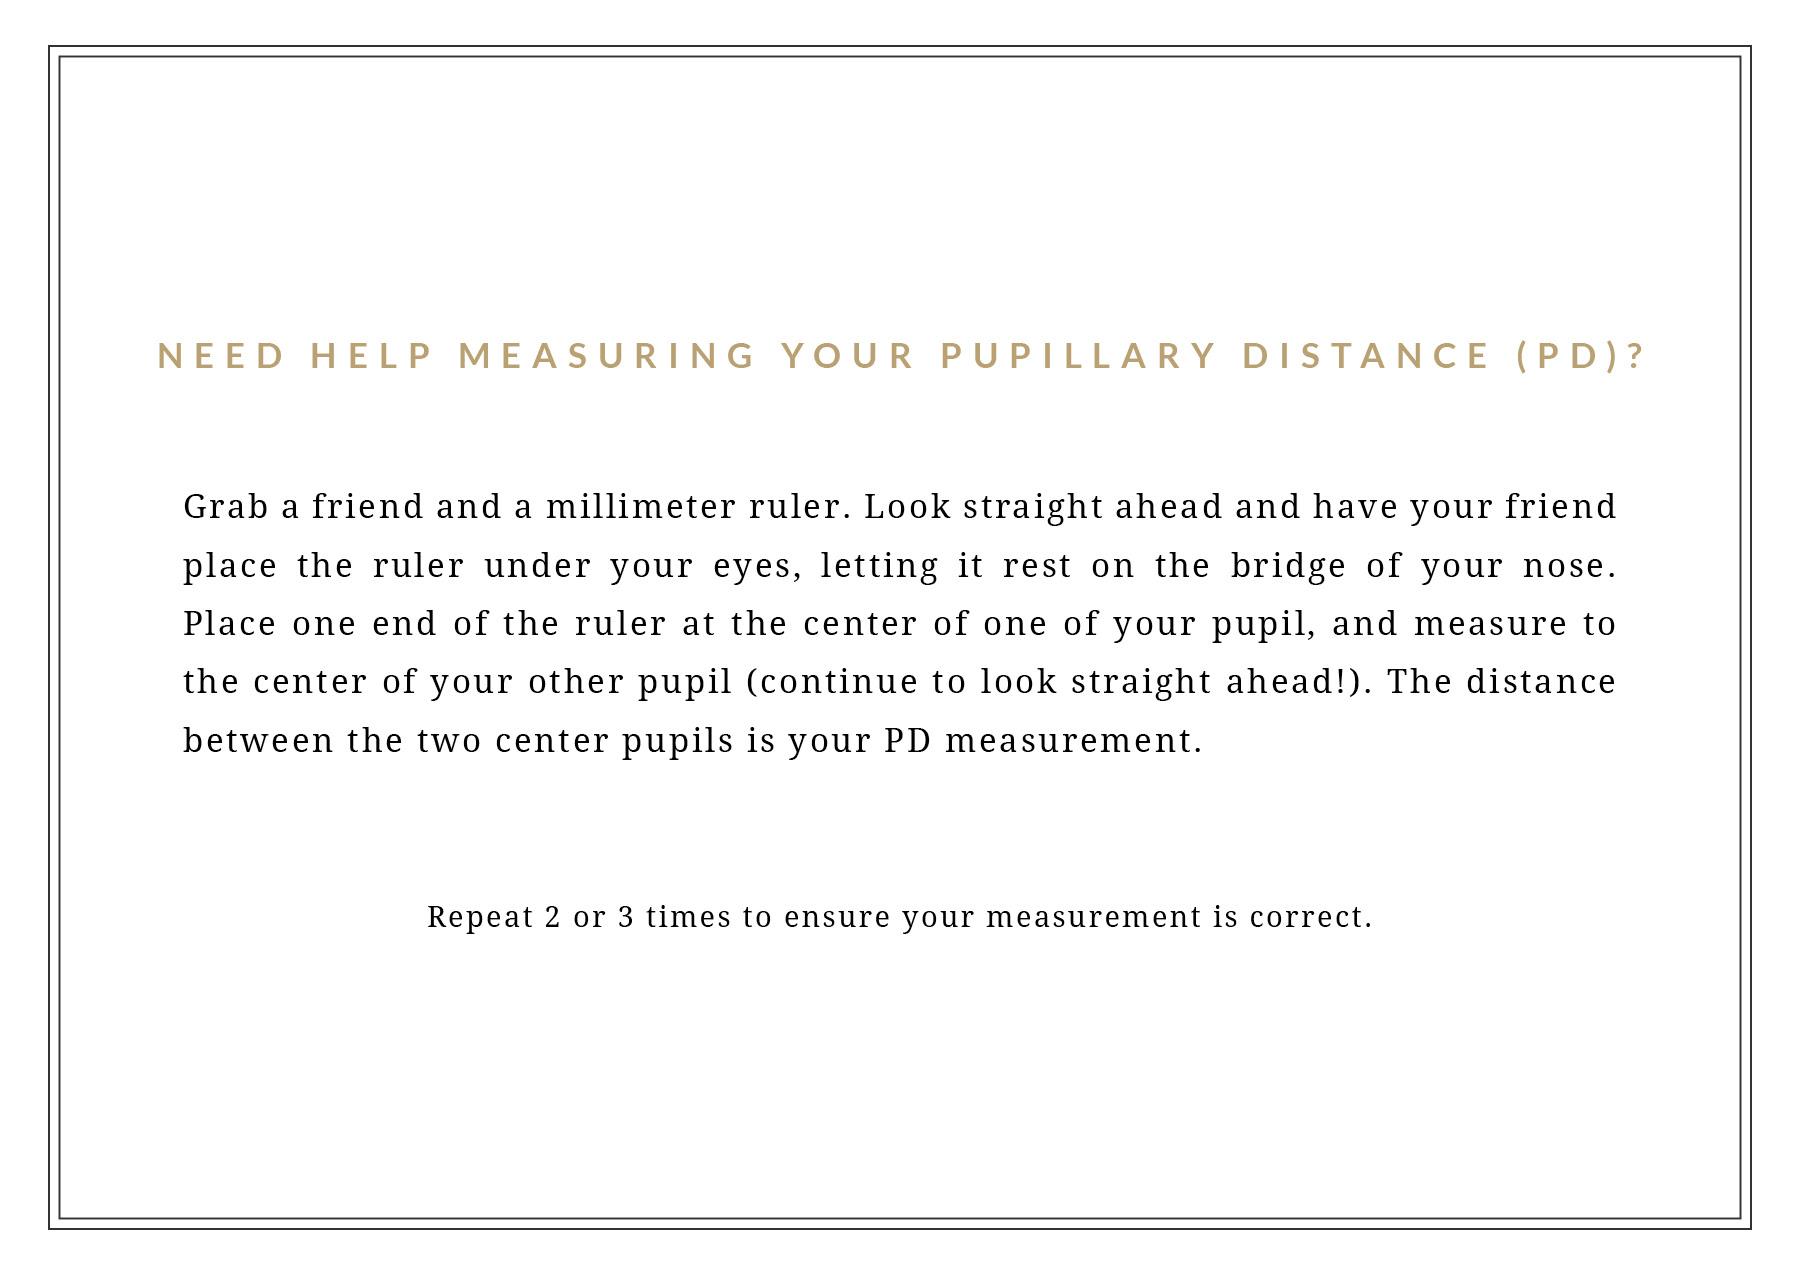 MILK Card-Pupillary Distance Side.jpg